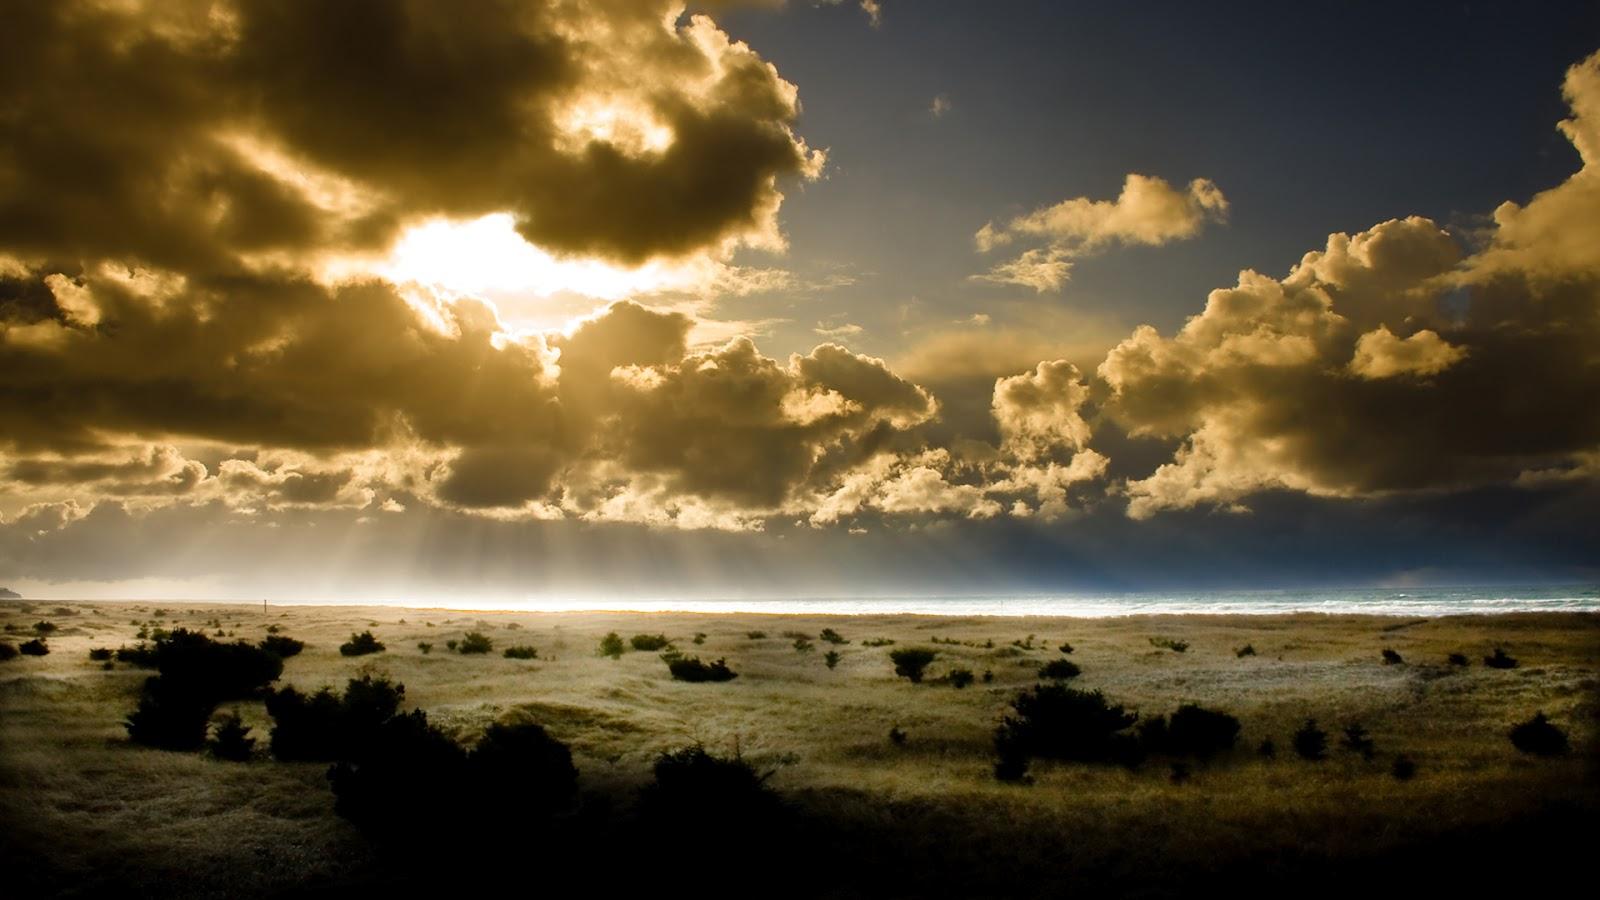 BEAUTIFUL SUN BEHIND THE CLOUDS HD WALLPAPER | Top HD Wallpapers